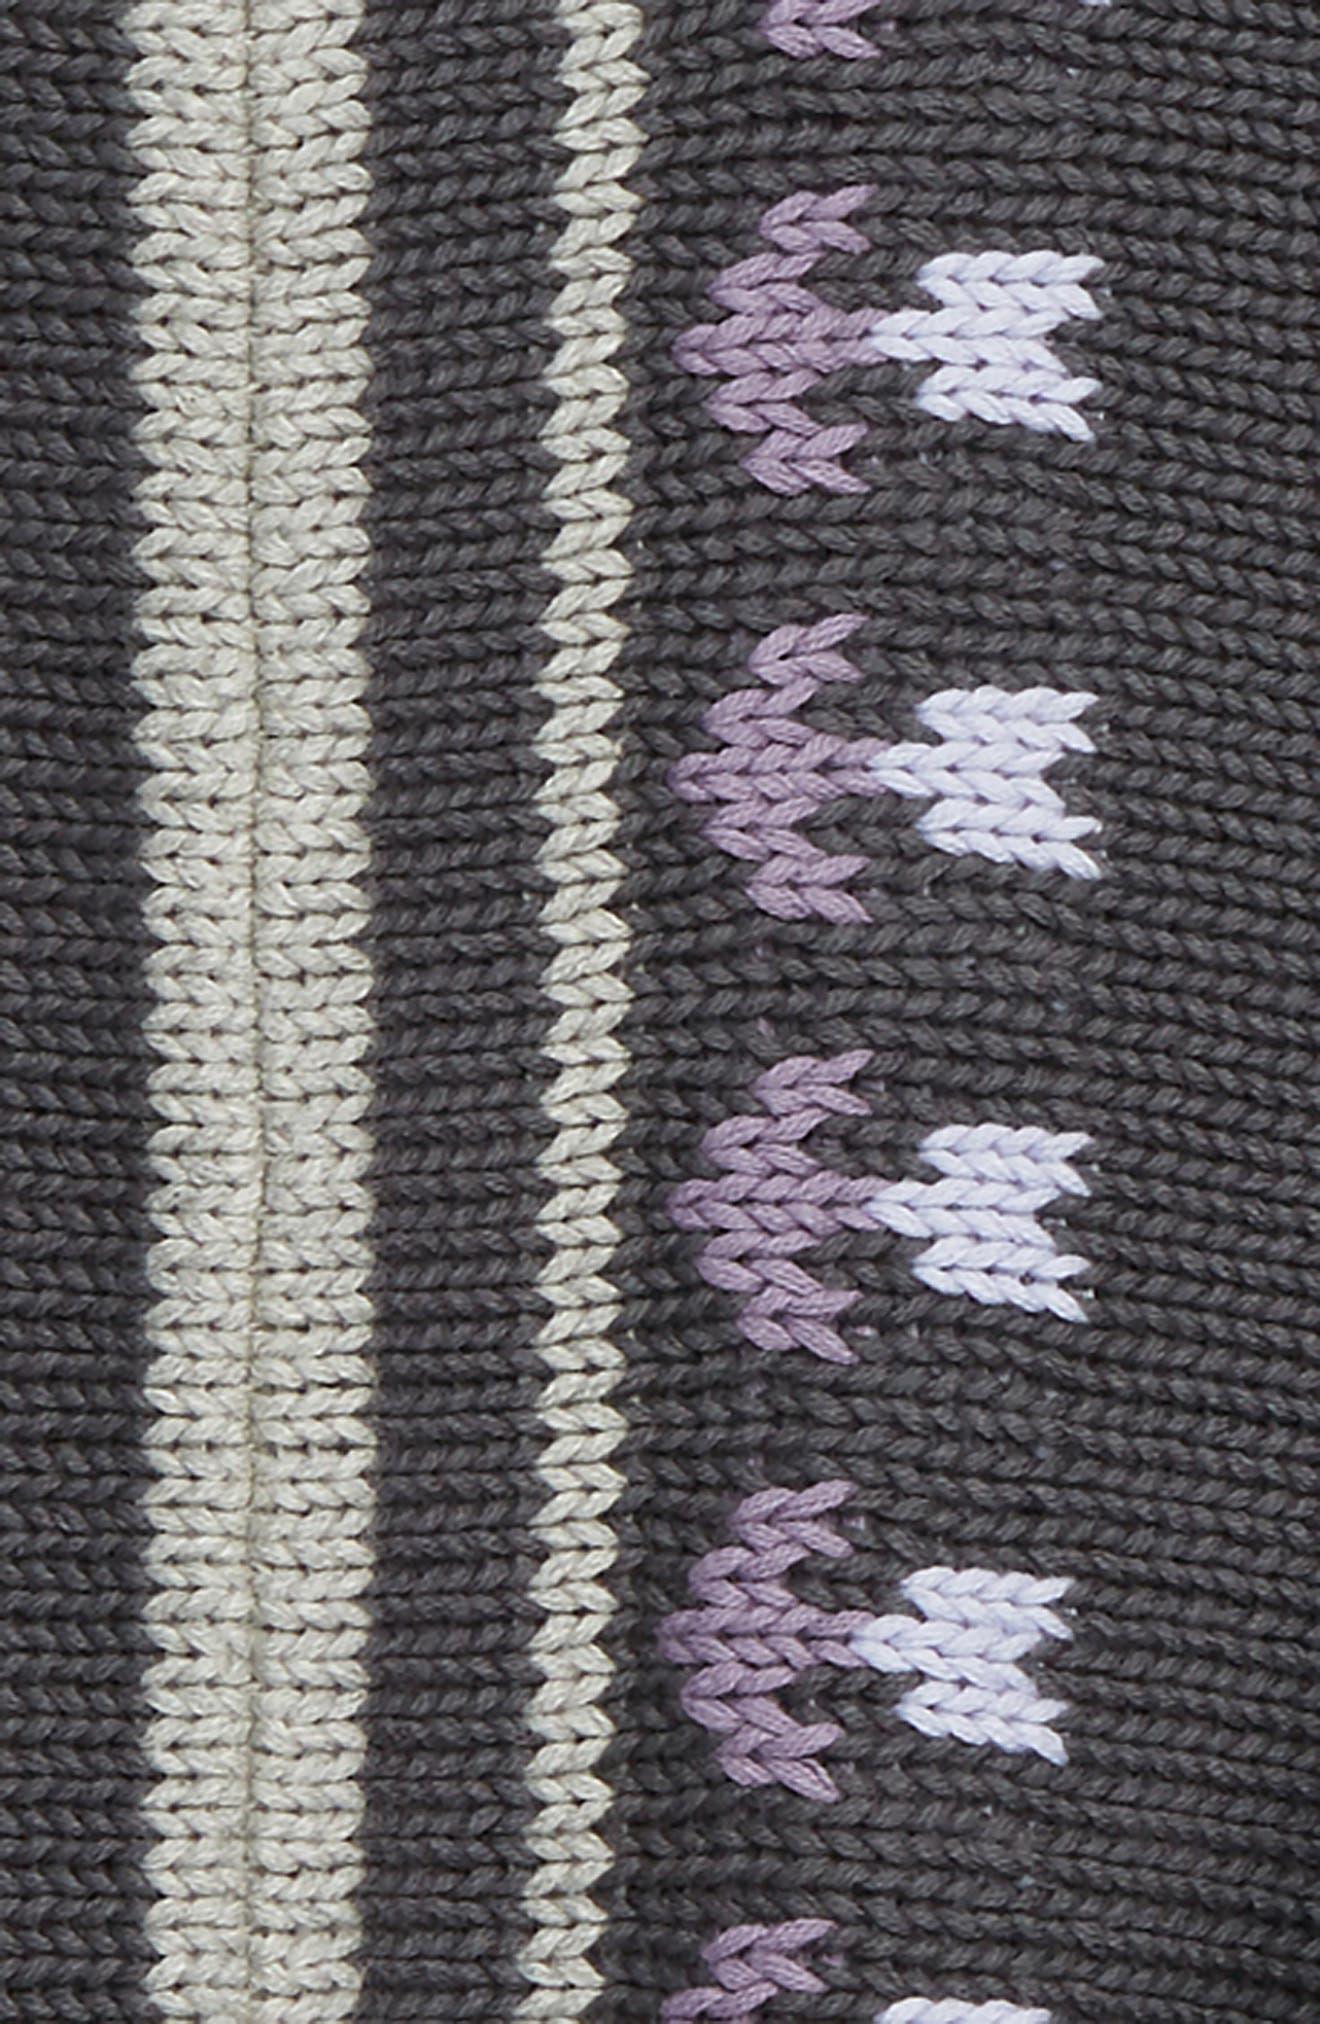 Floral Stripe Knit Poncho,                             Alternate thumbnail 2, color,                             023